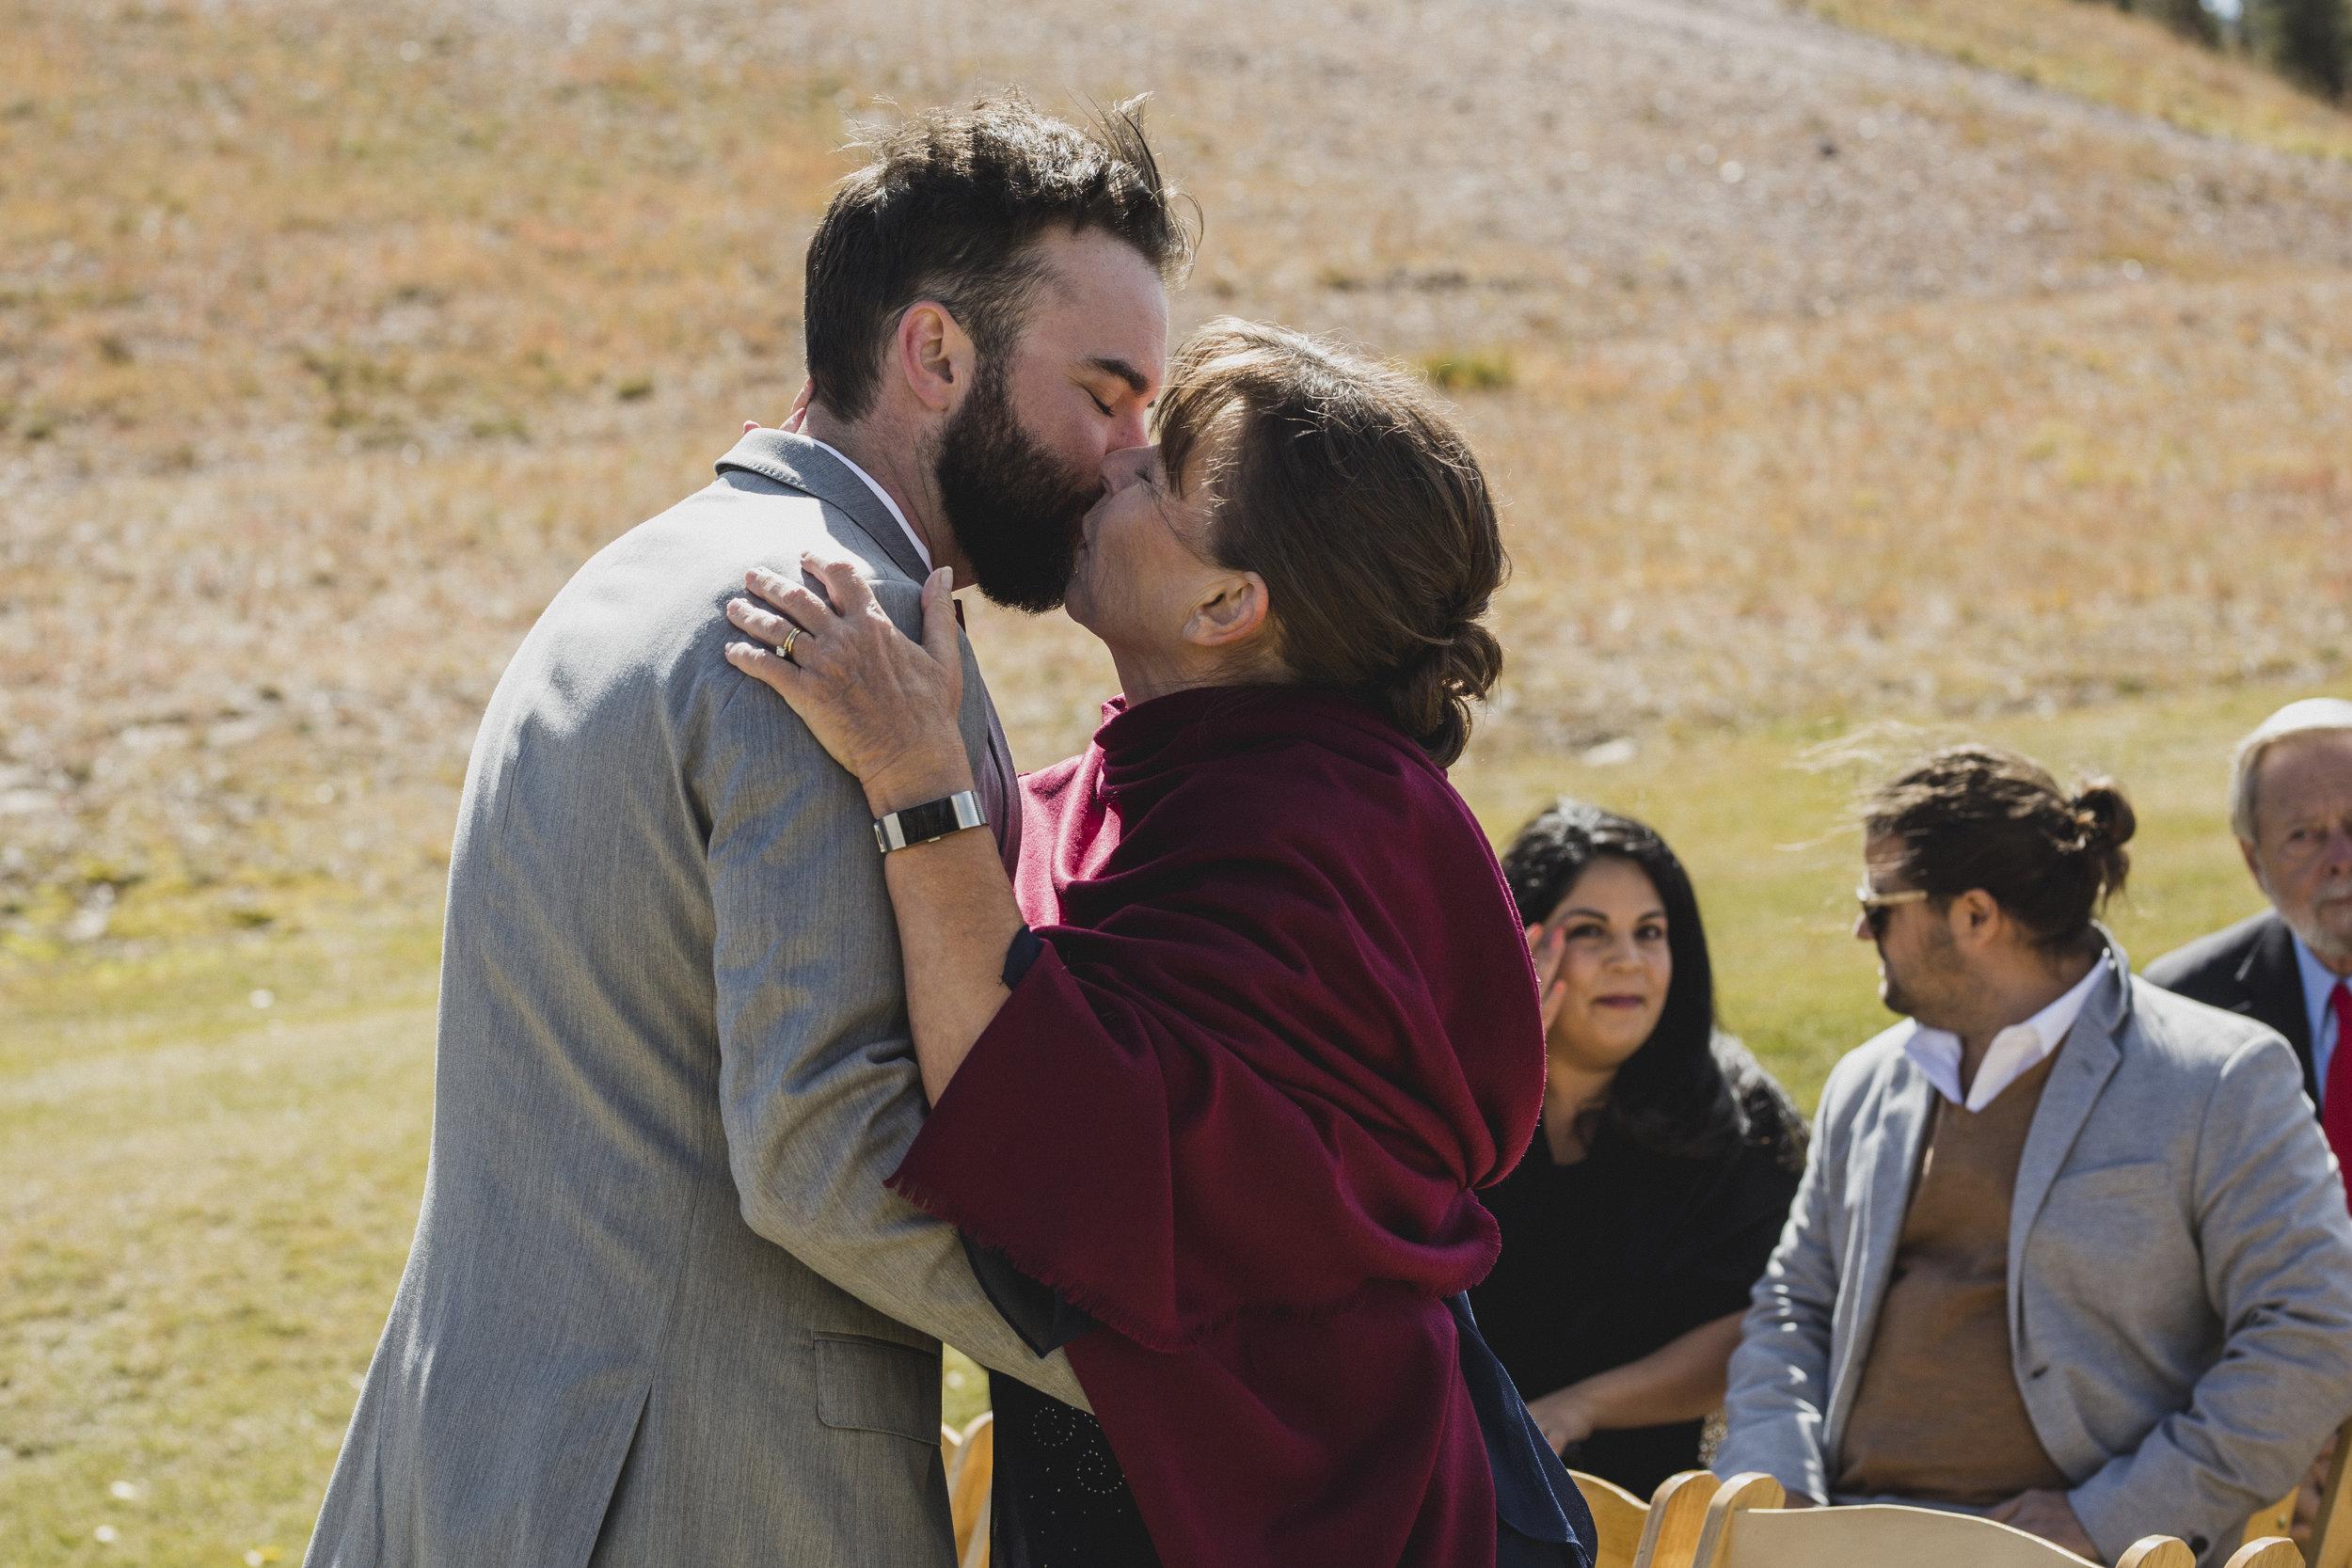 NE-LeahandAshtonphotography-Telluride-Wedding-Photography-9249.jpg